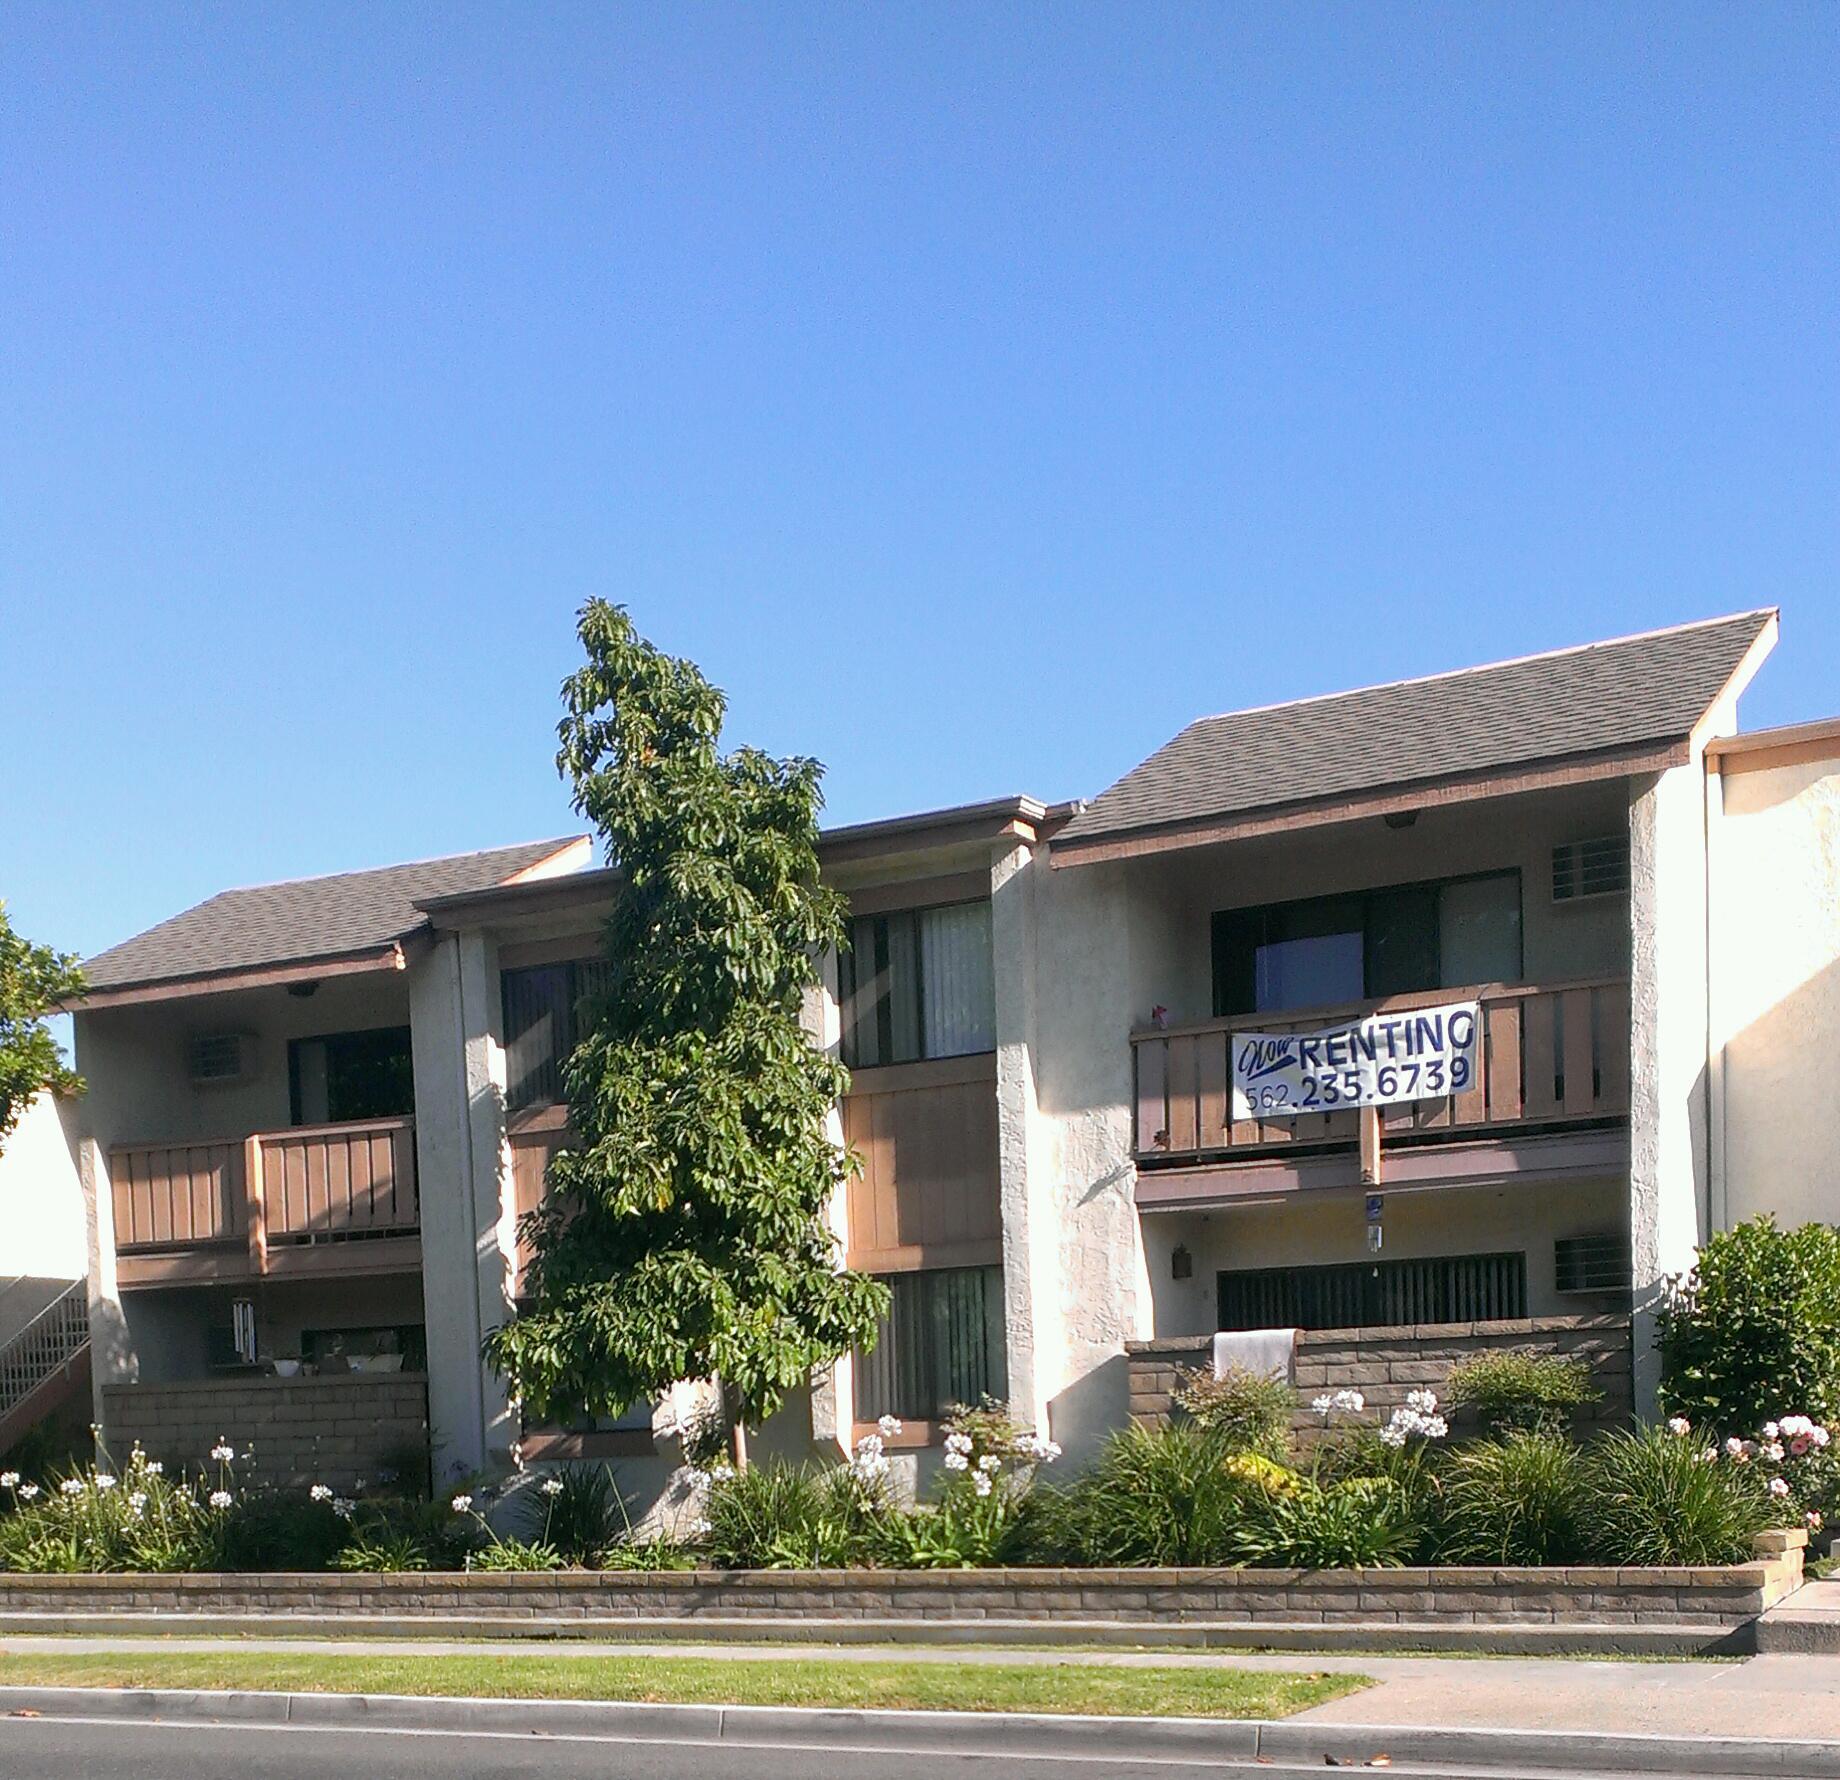 Apartment Rental Management Companies: Property Management & Apartment Rentals